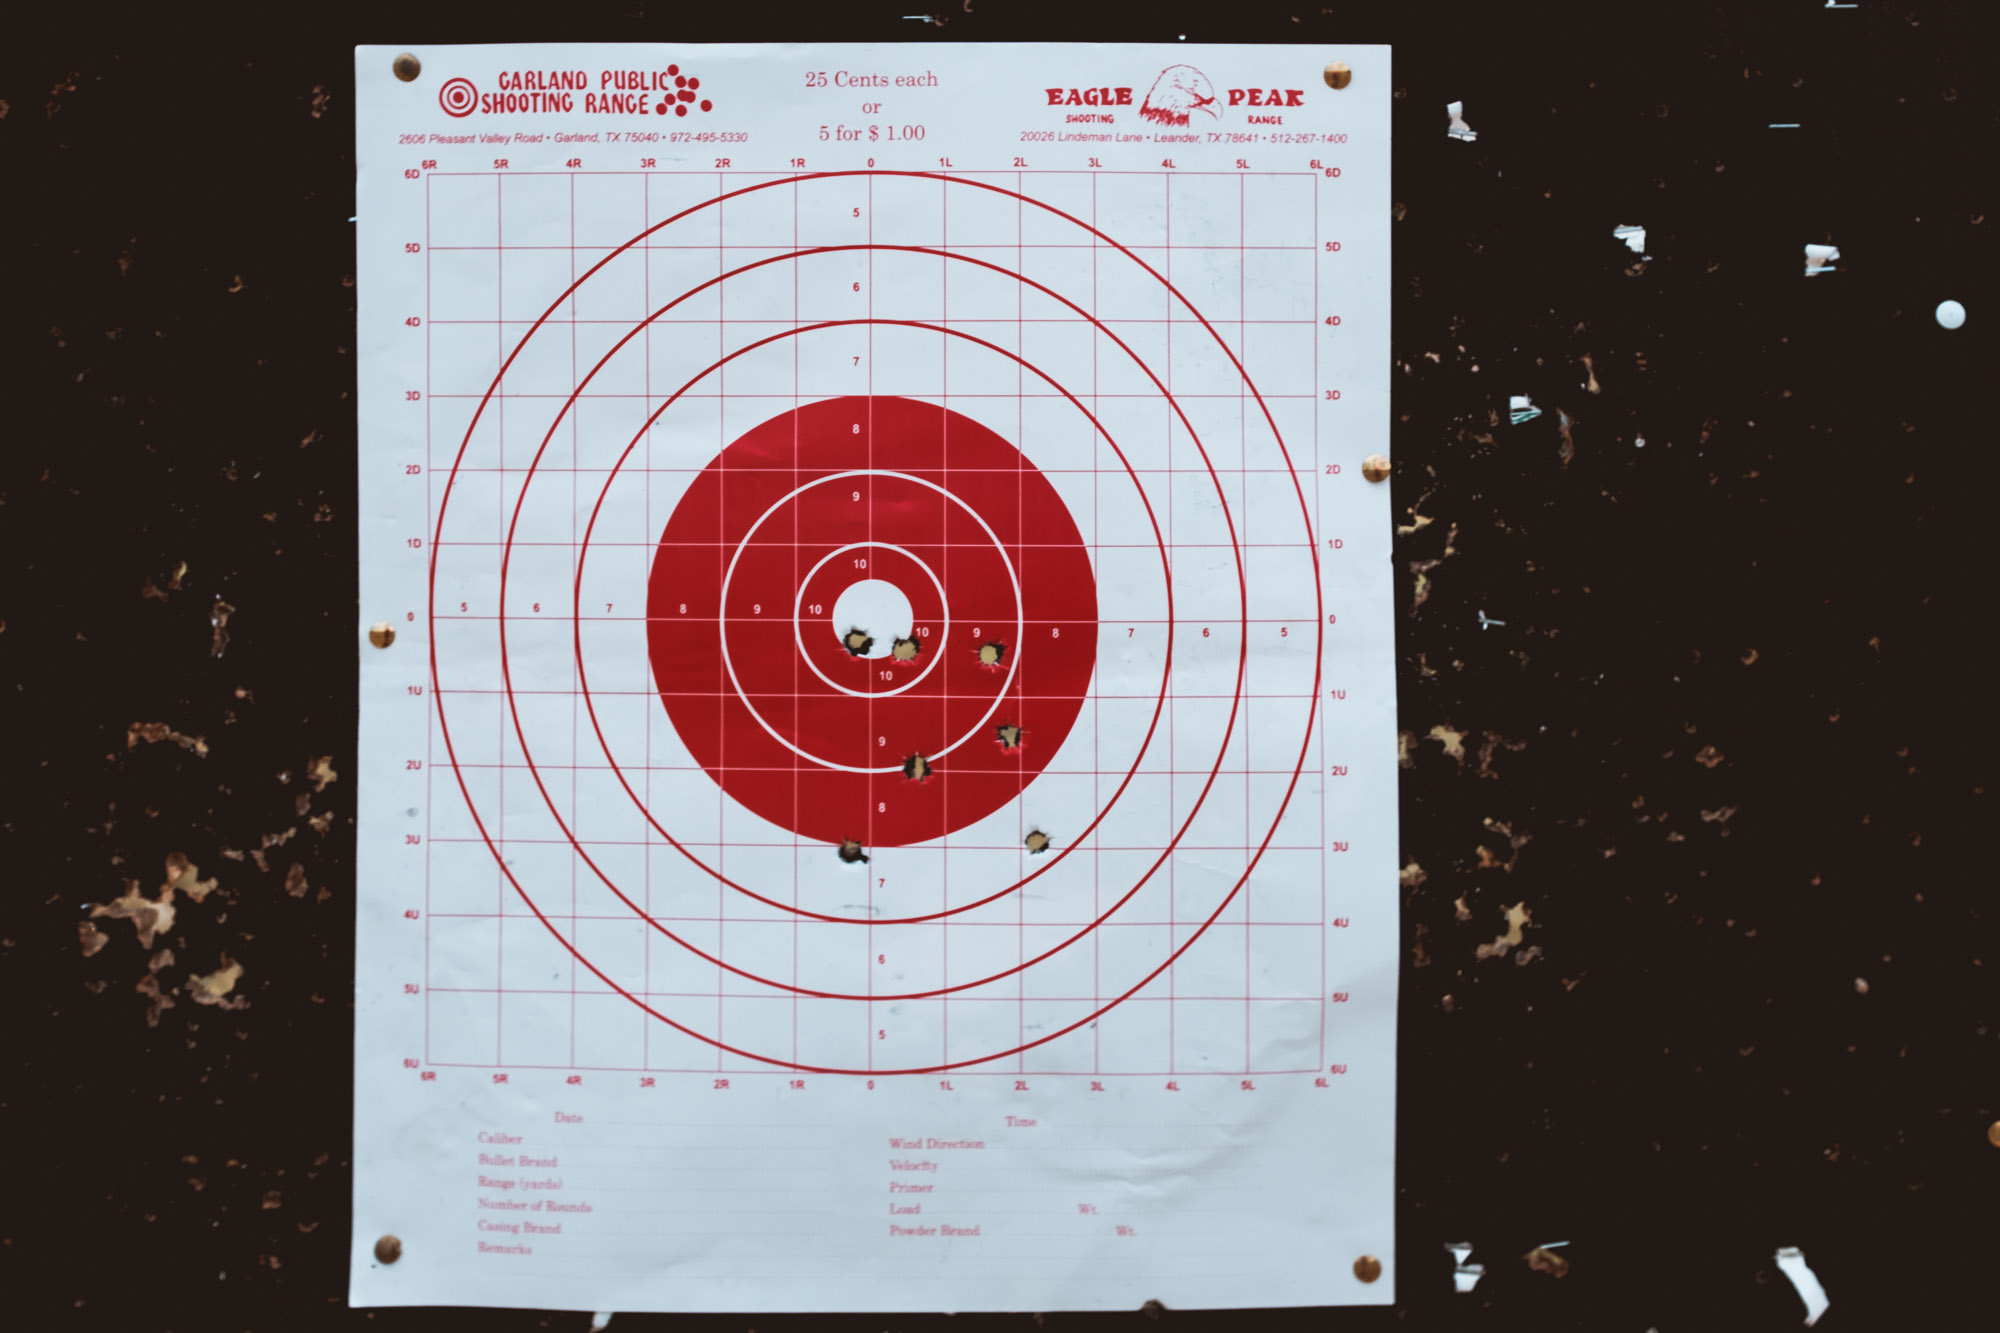 Bullseye Garland Shooting Range